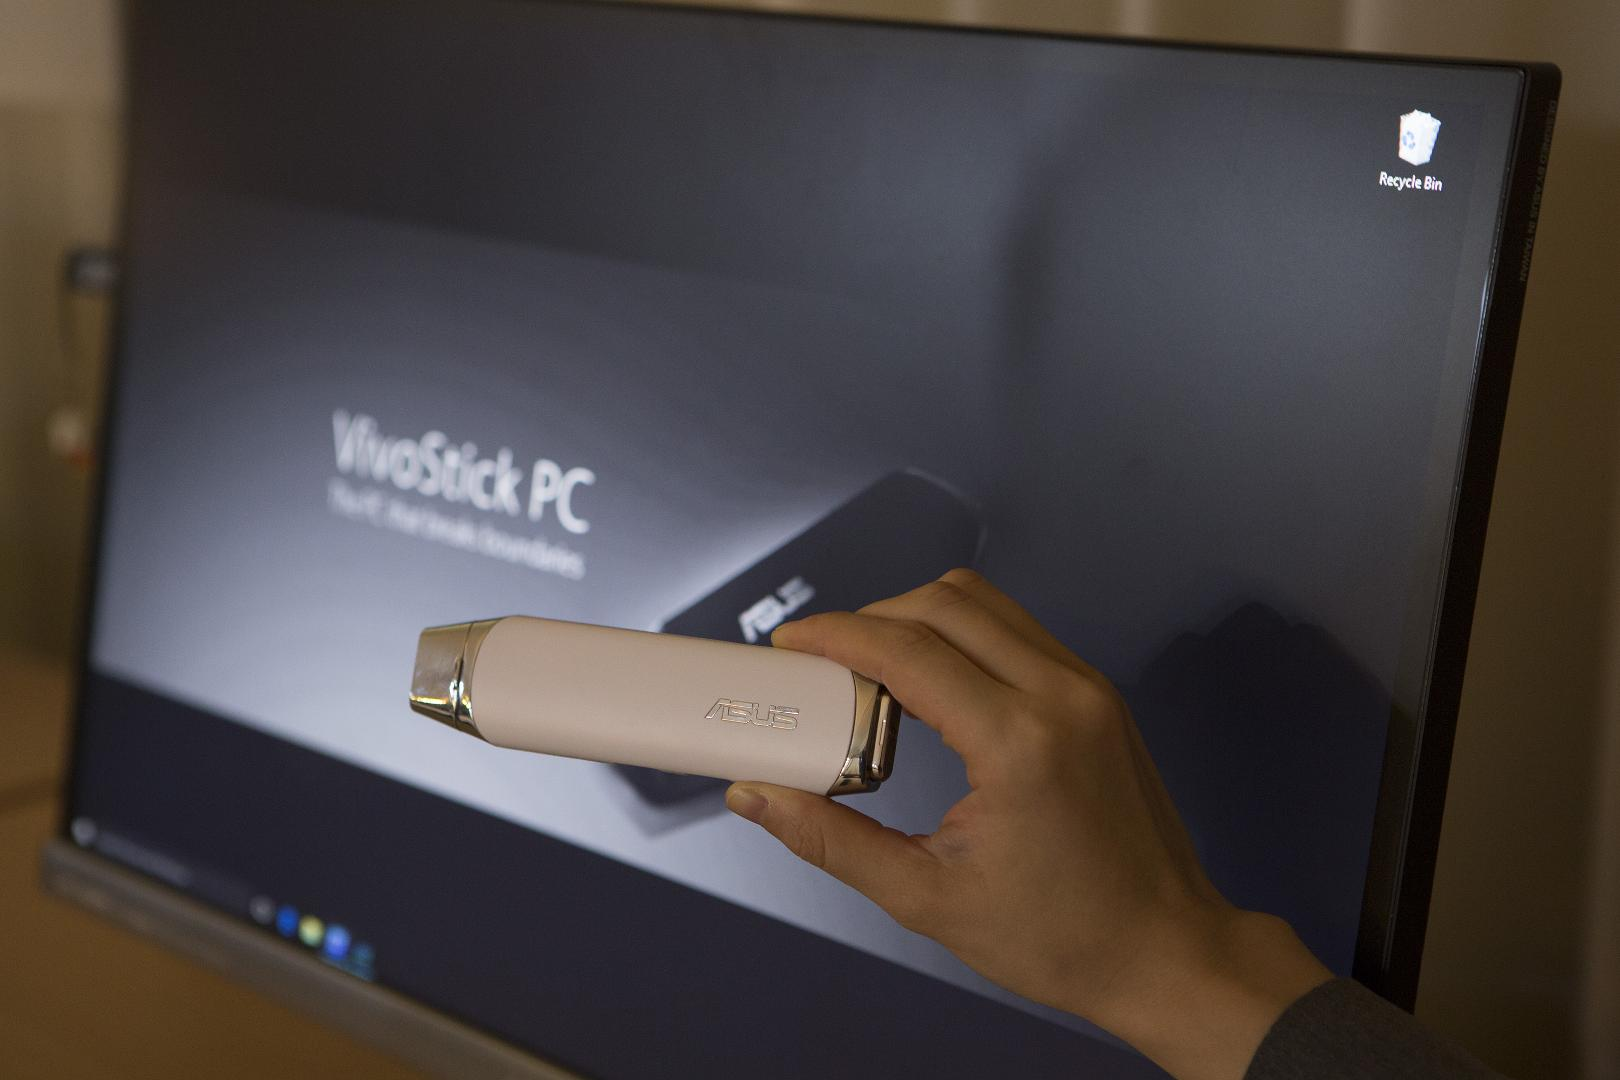 S1920x1080_VivoStick PC TS10